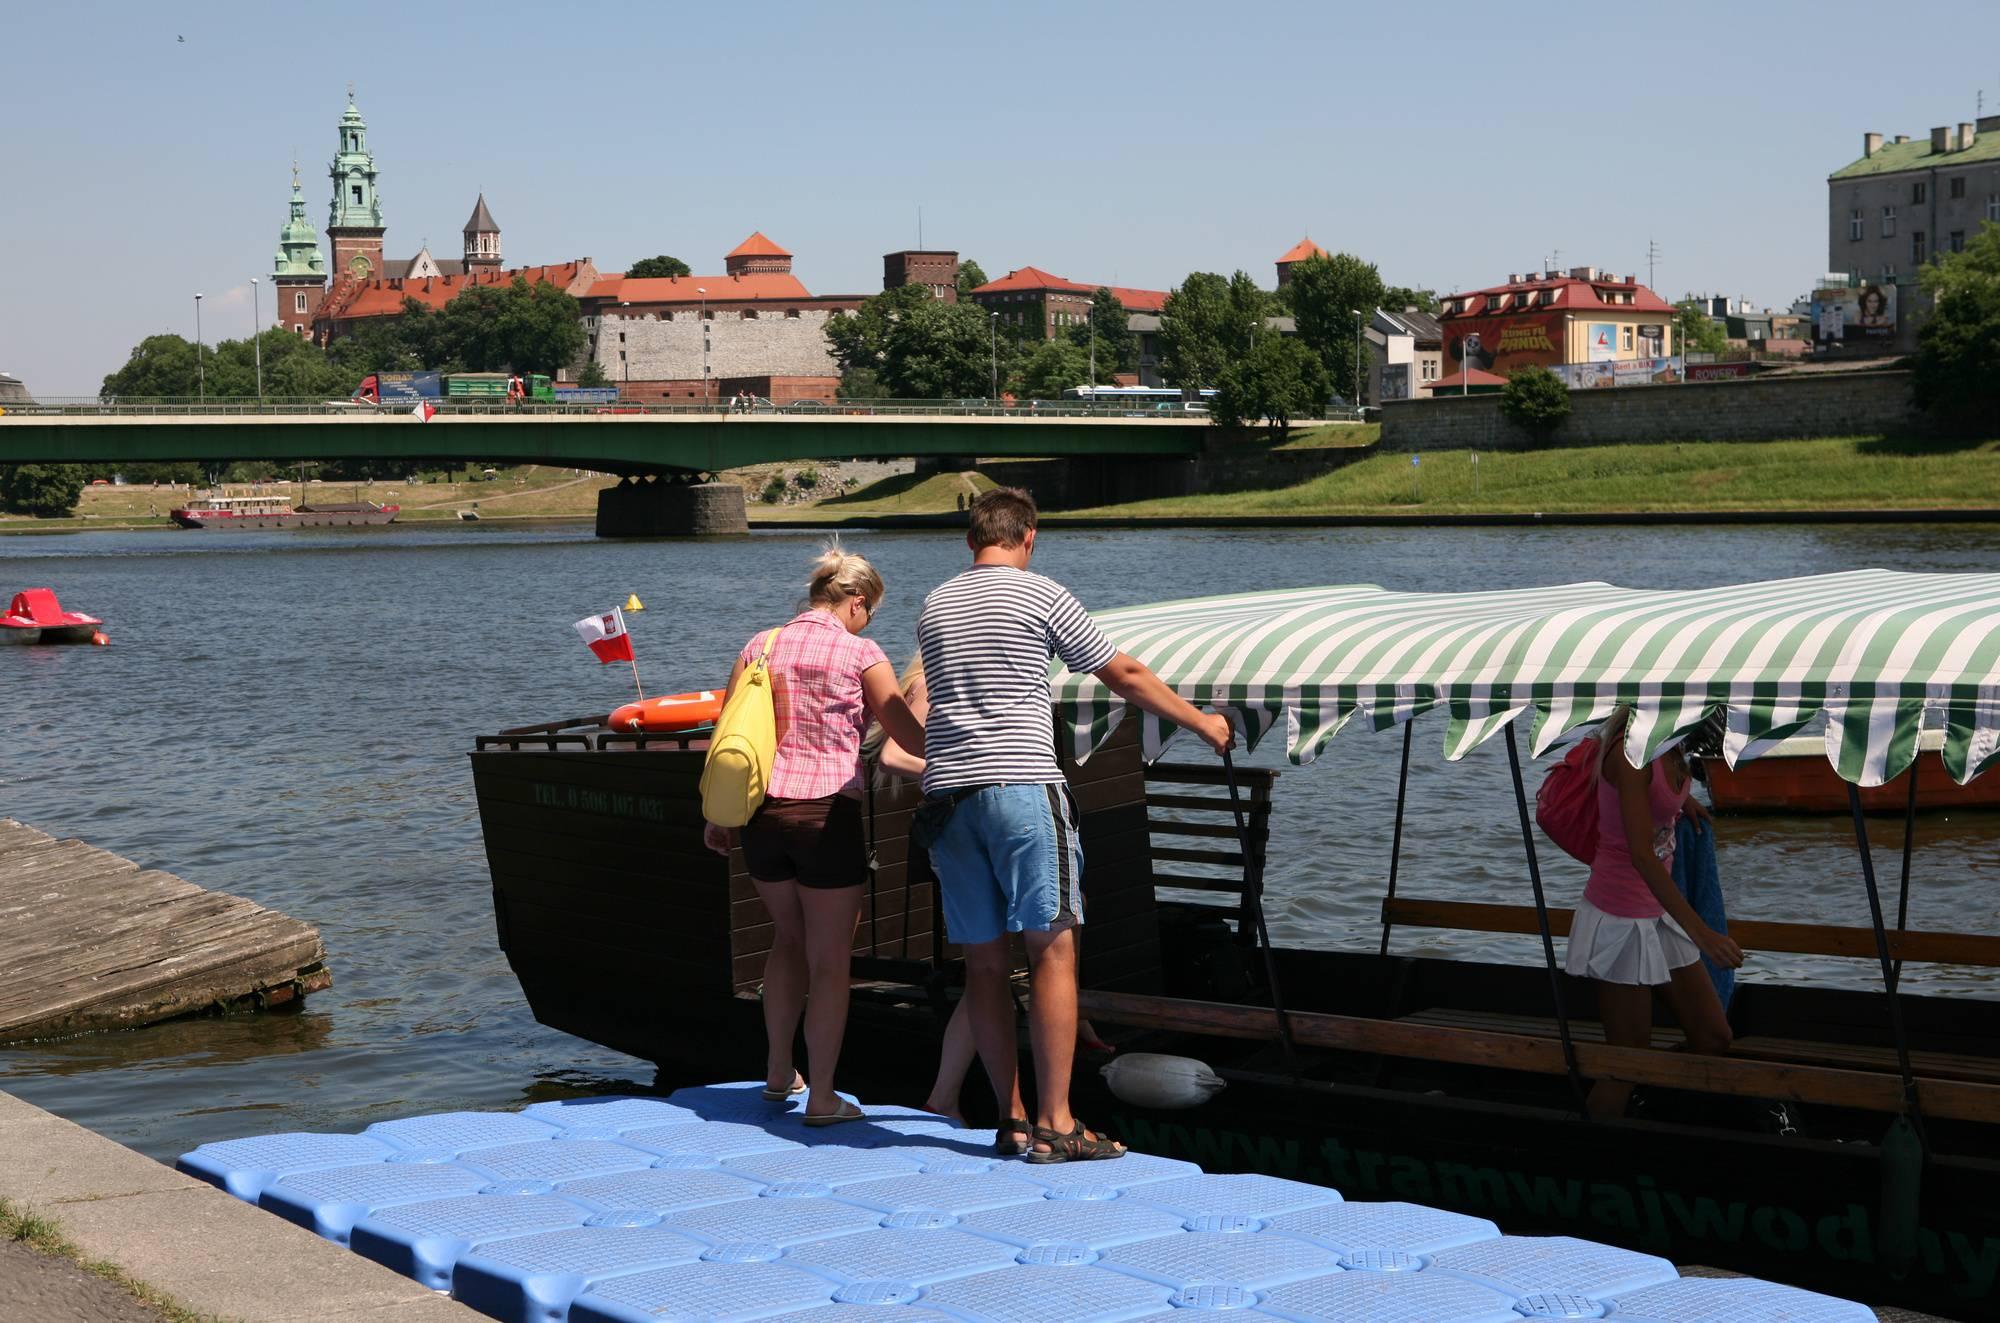 Purenudism Photos-River Boat Preparations - 3